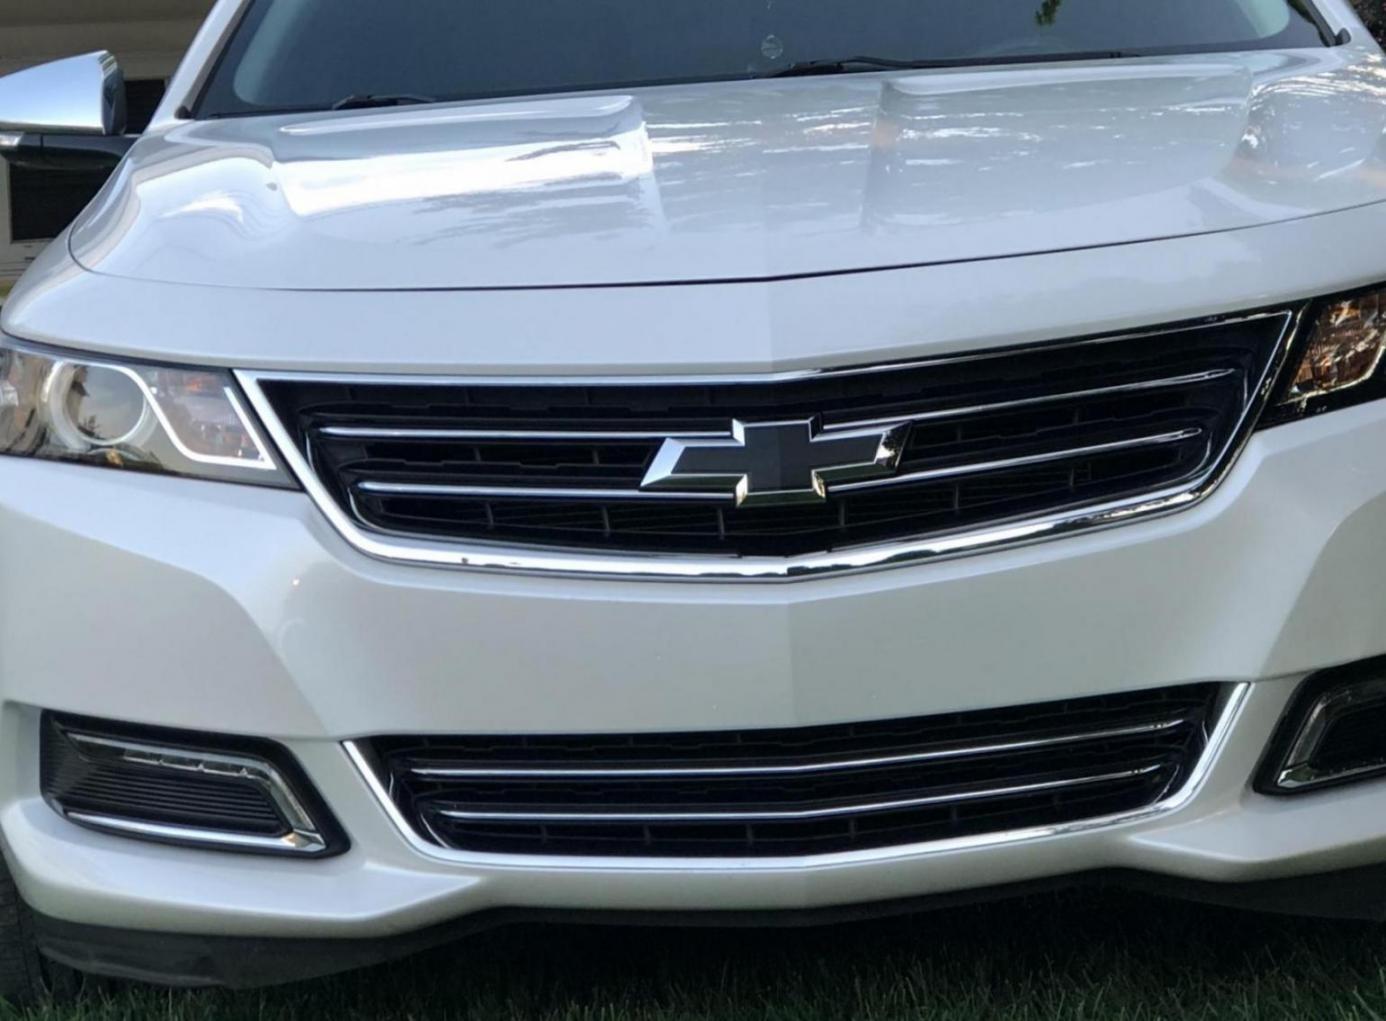 Hello Epsilon II- 2014 Impala LTZ-2336eb69-3f62-4bd1-832f-bc62d823aaae_1528043634331.jpeg